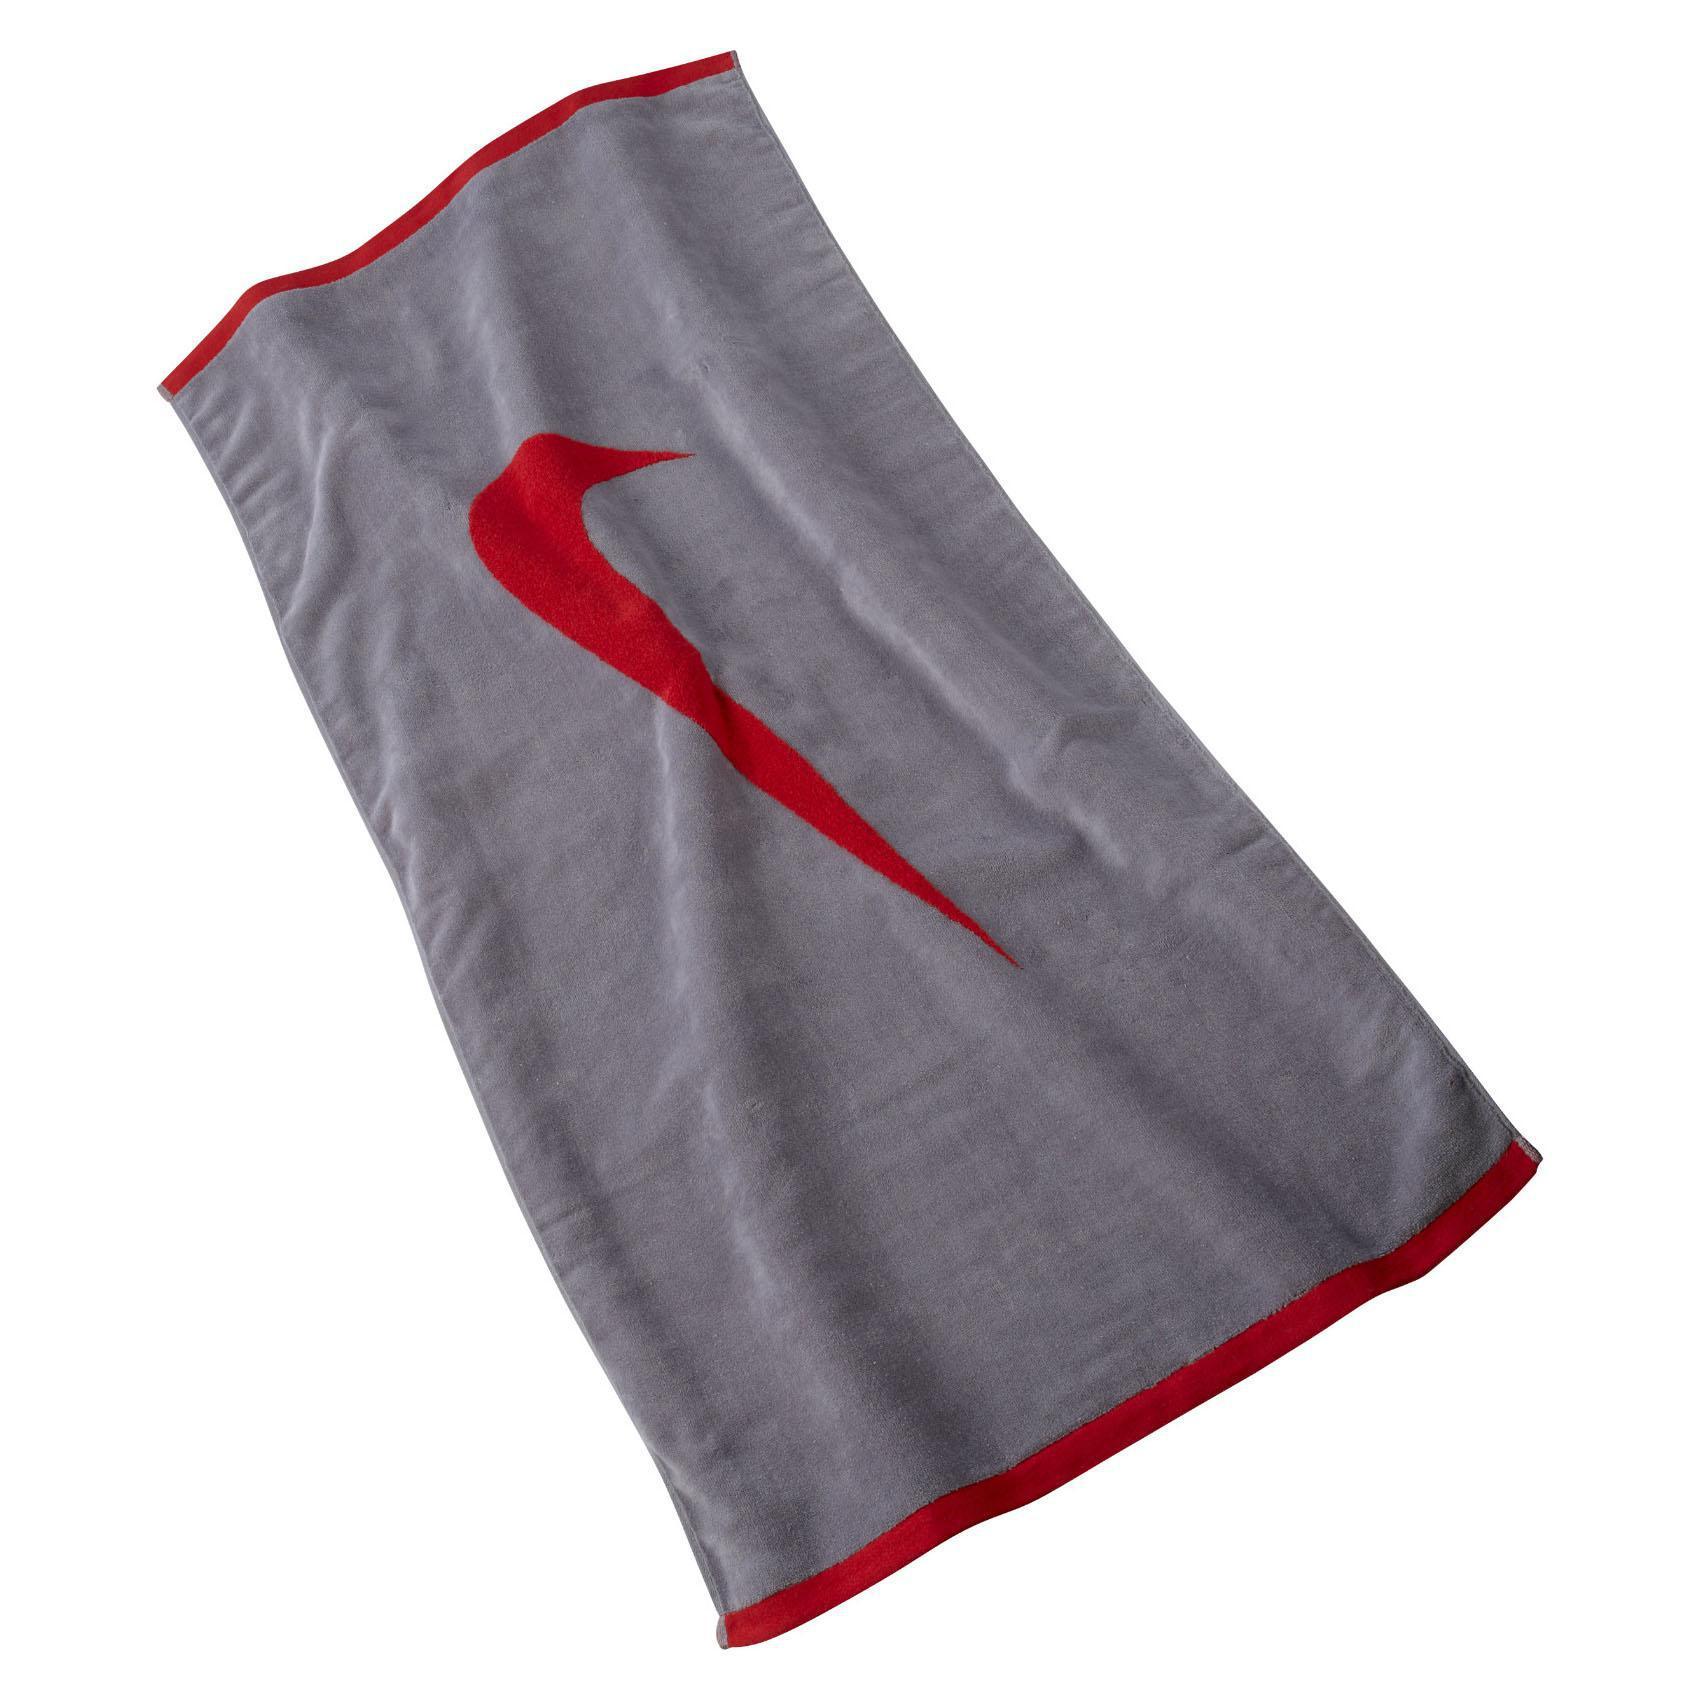 Sports Towel Absorption: Nike Swoosh Sports Towel Large